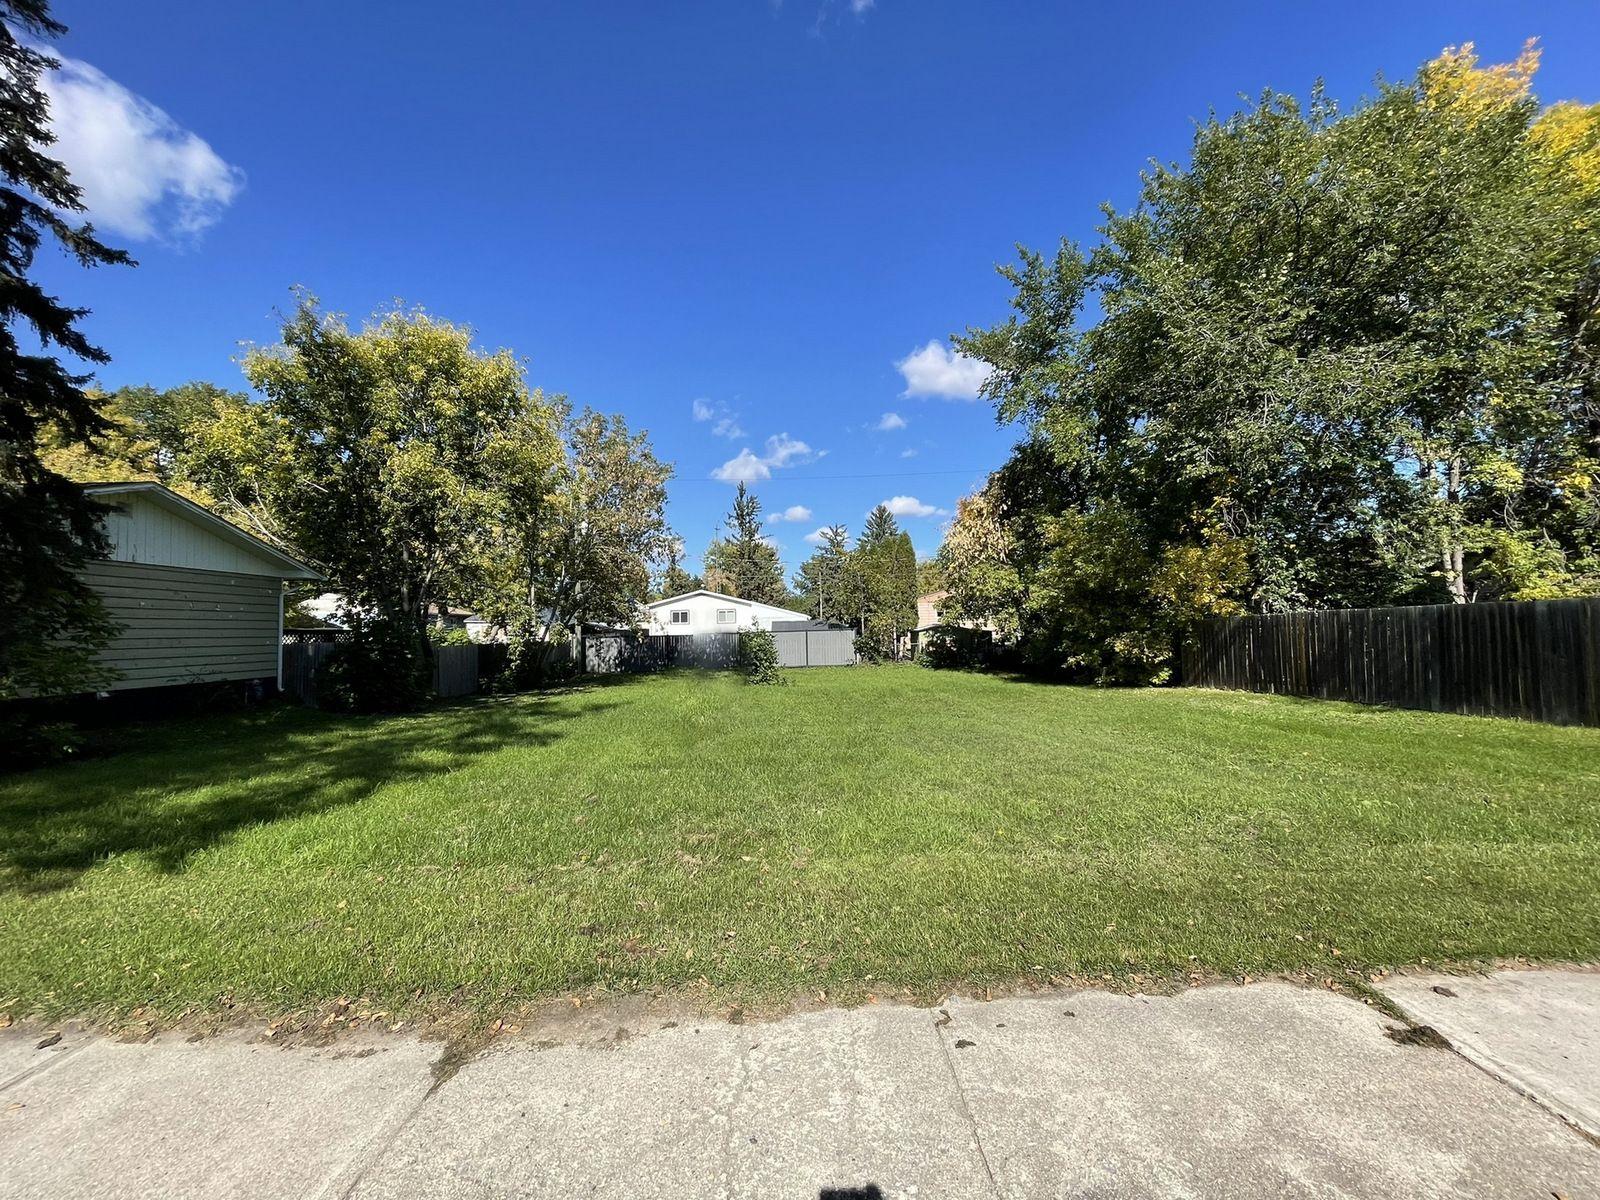 Main Photo: 250 5th Avenue NE in Portage la Prairie RM: Vacant Land for sale (74'x100')  : MLS®# 202123223